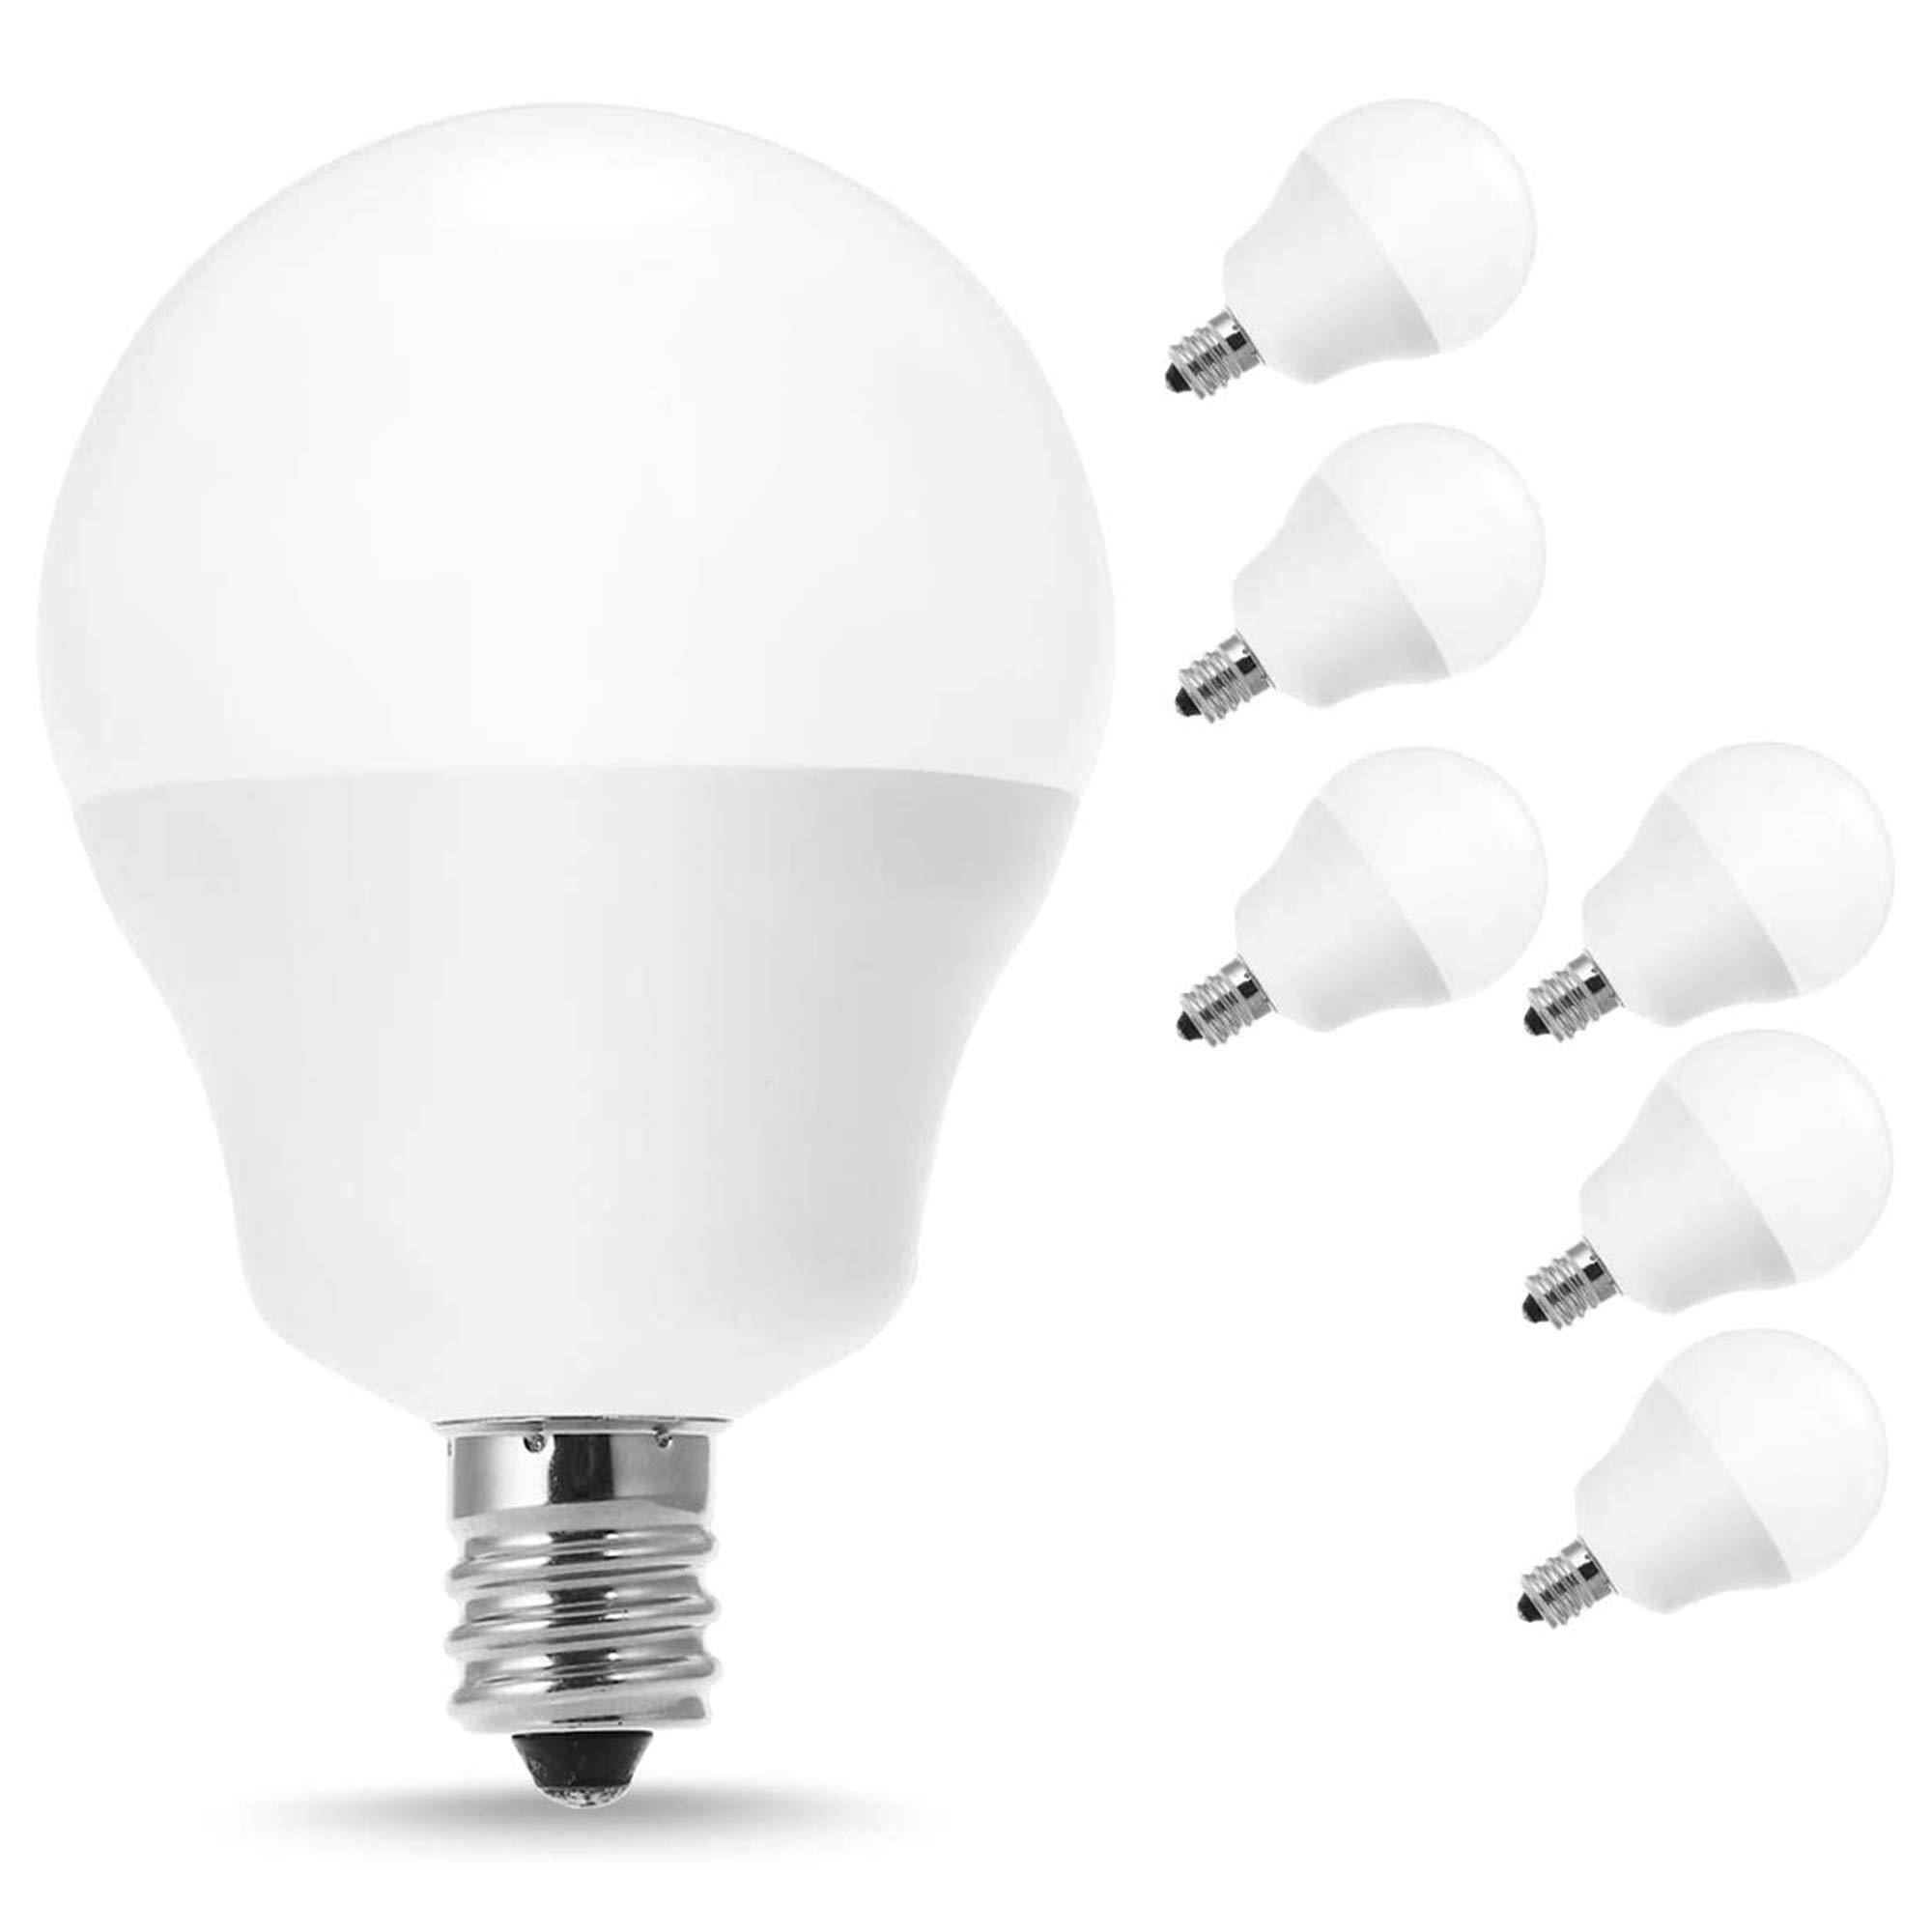 Jandcase E12 Candelabra Led Bulb 40w Equivalent G14 Led Bulbs Soft White 3000k 5w Ceiling Fan Light 450lm Vanity Mirror Lighting For Bathroom Living Room Bedroom Not Dimmable Pack Of 6